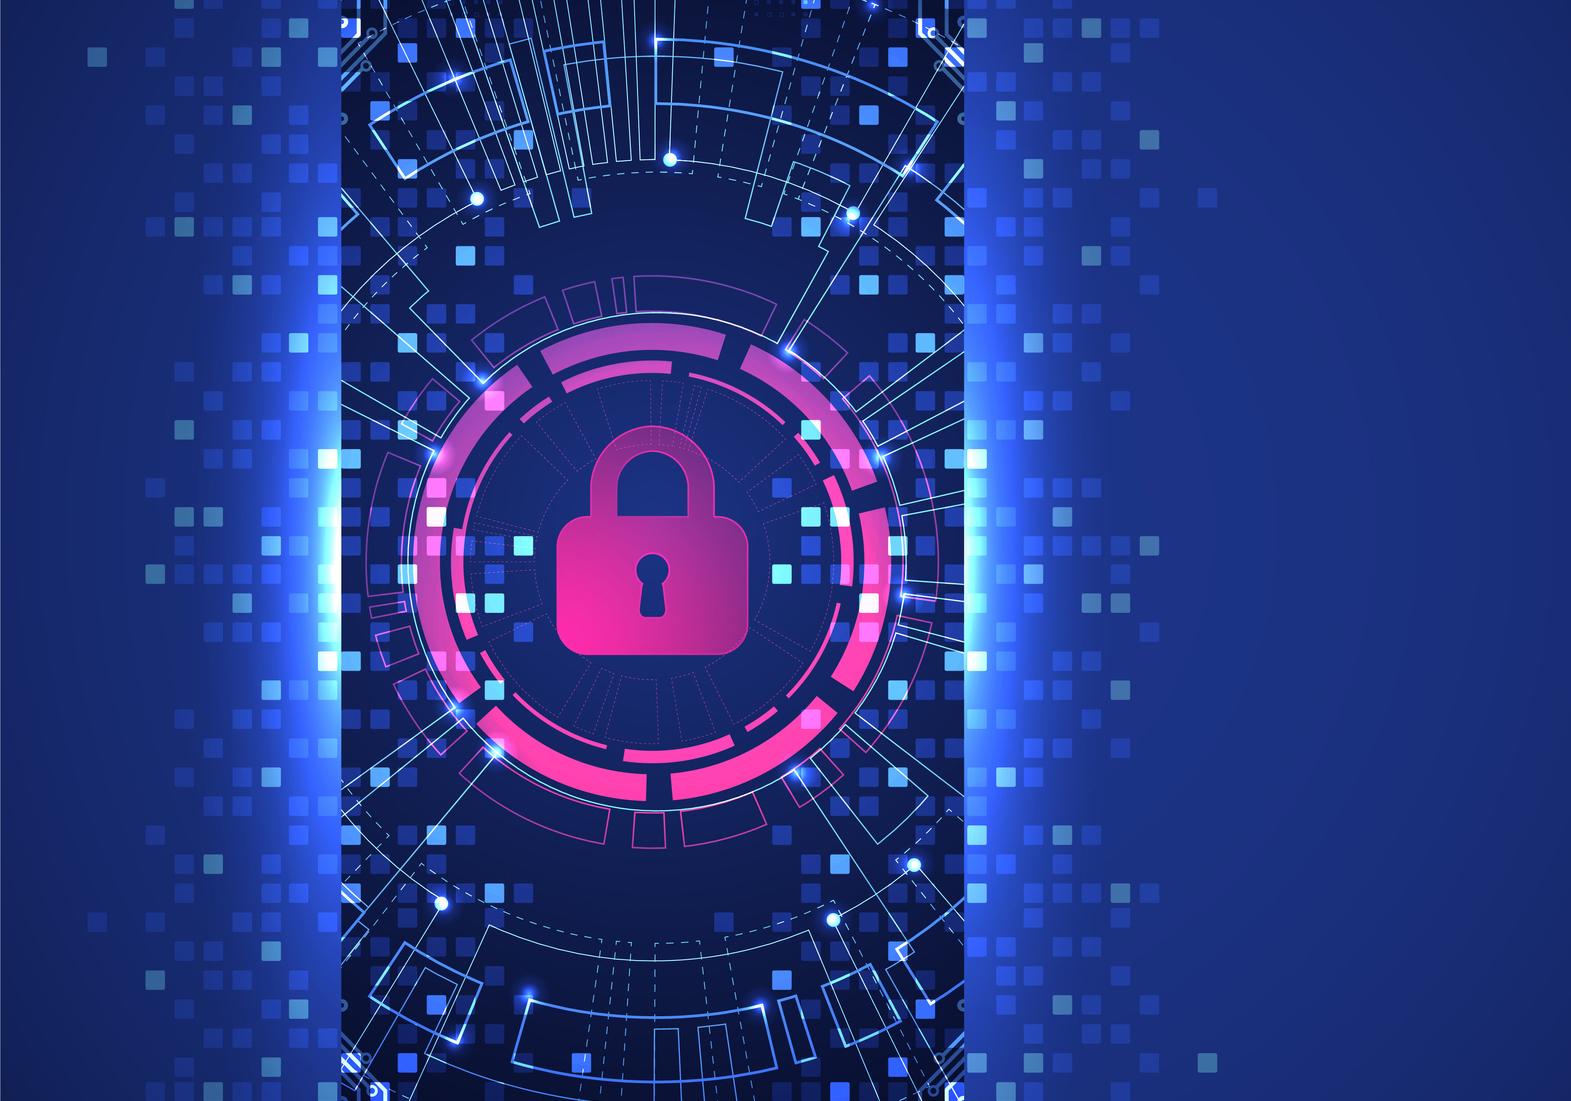 Thoma Bravo Offers $3.9B for U.K. Cyber Firm Sophos - CFO